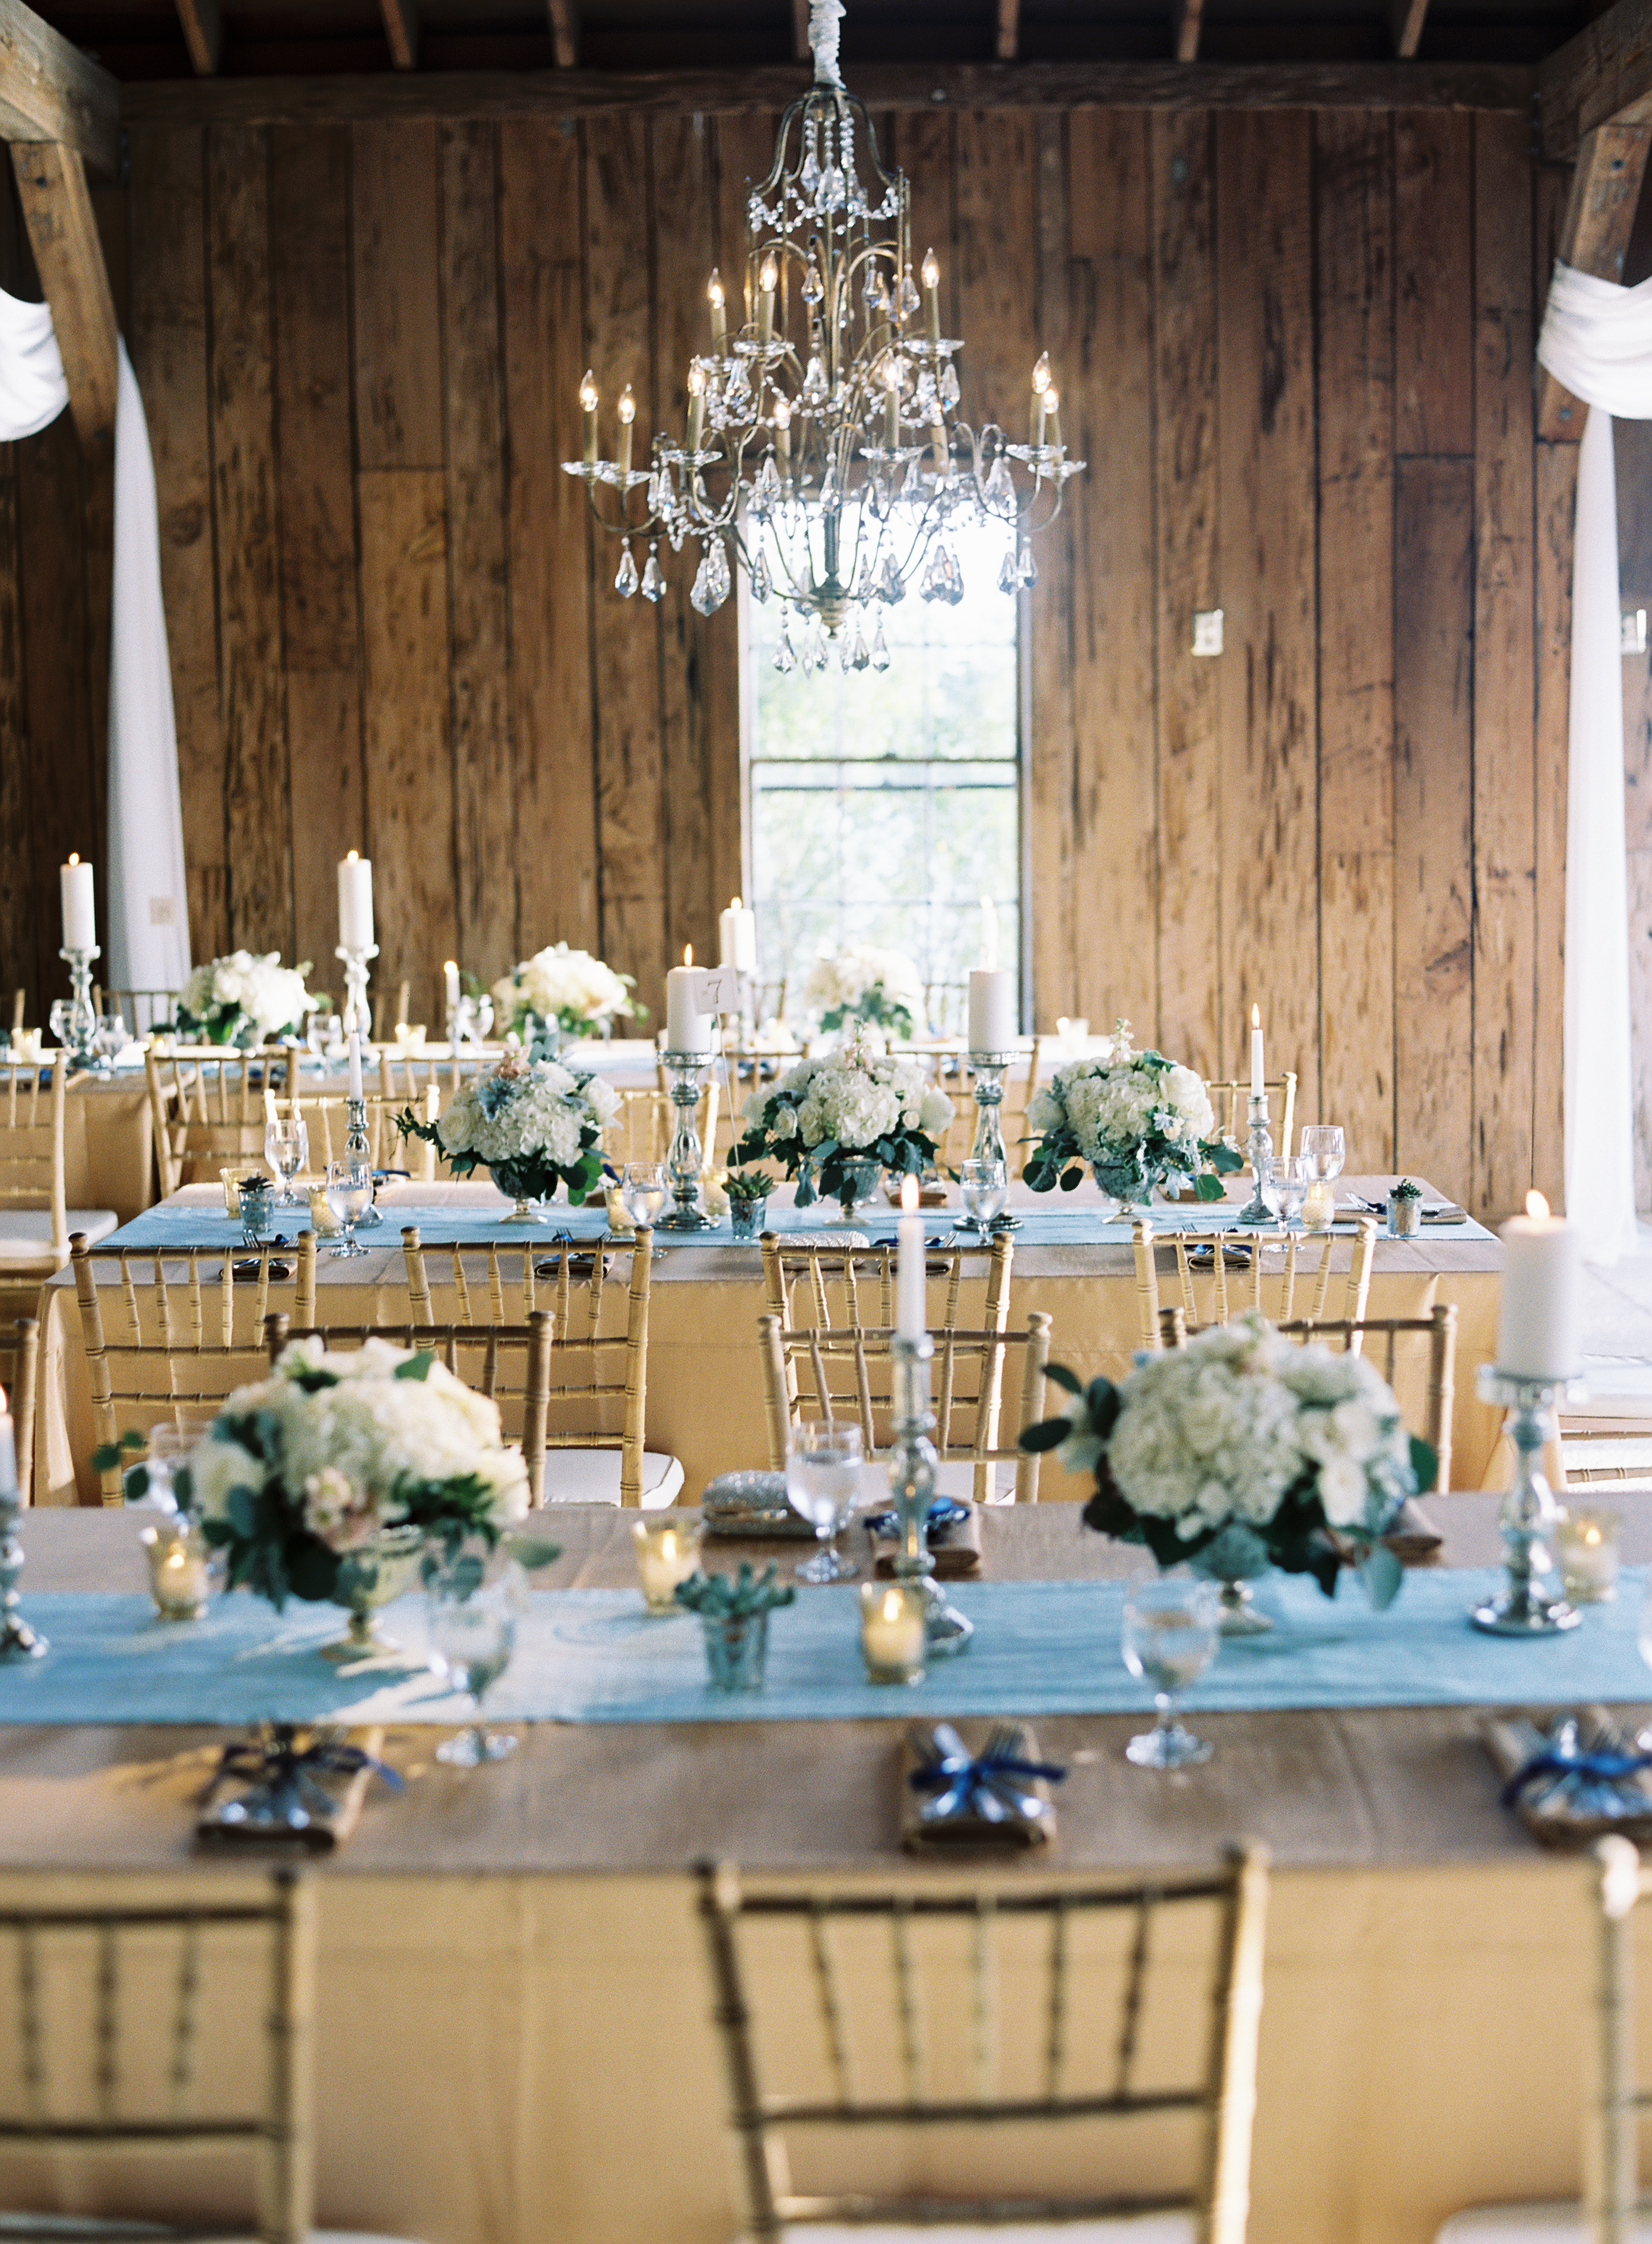 Barn Wedding Decorations 52 Popular  Blue and Gold